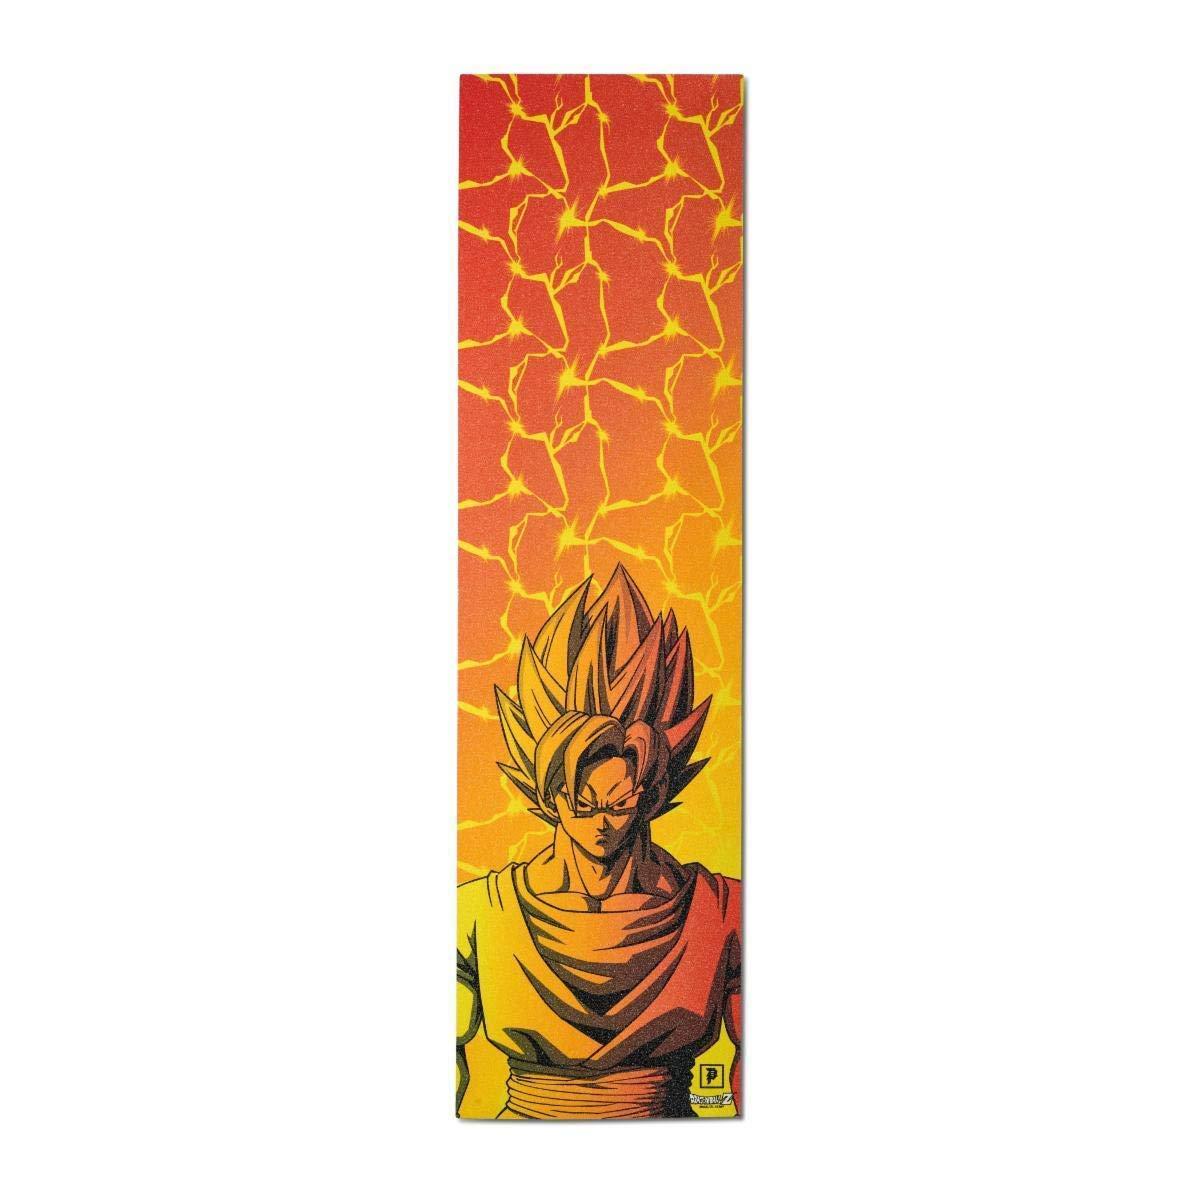 Primitive x Dragon Ball Z Goku Skateboard Grip Tape